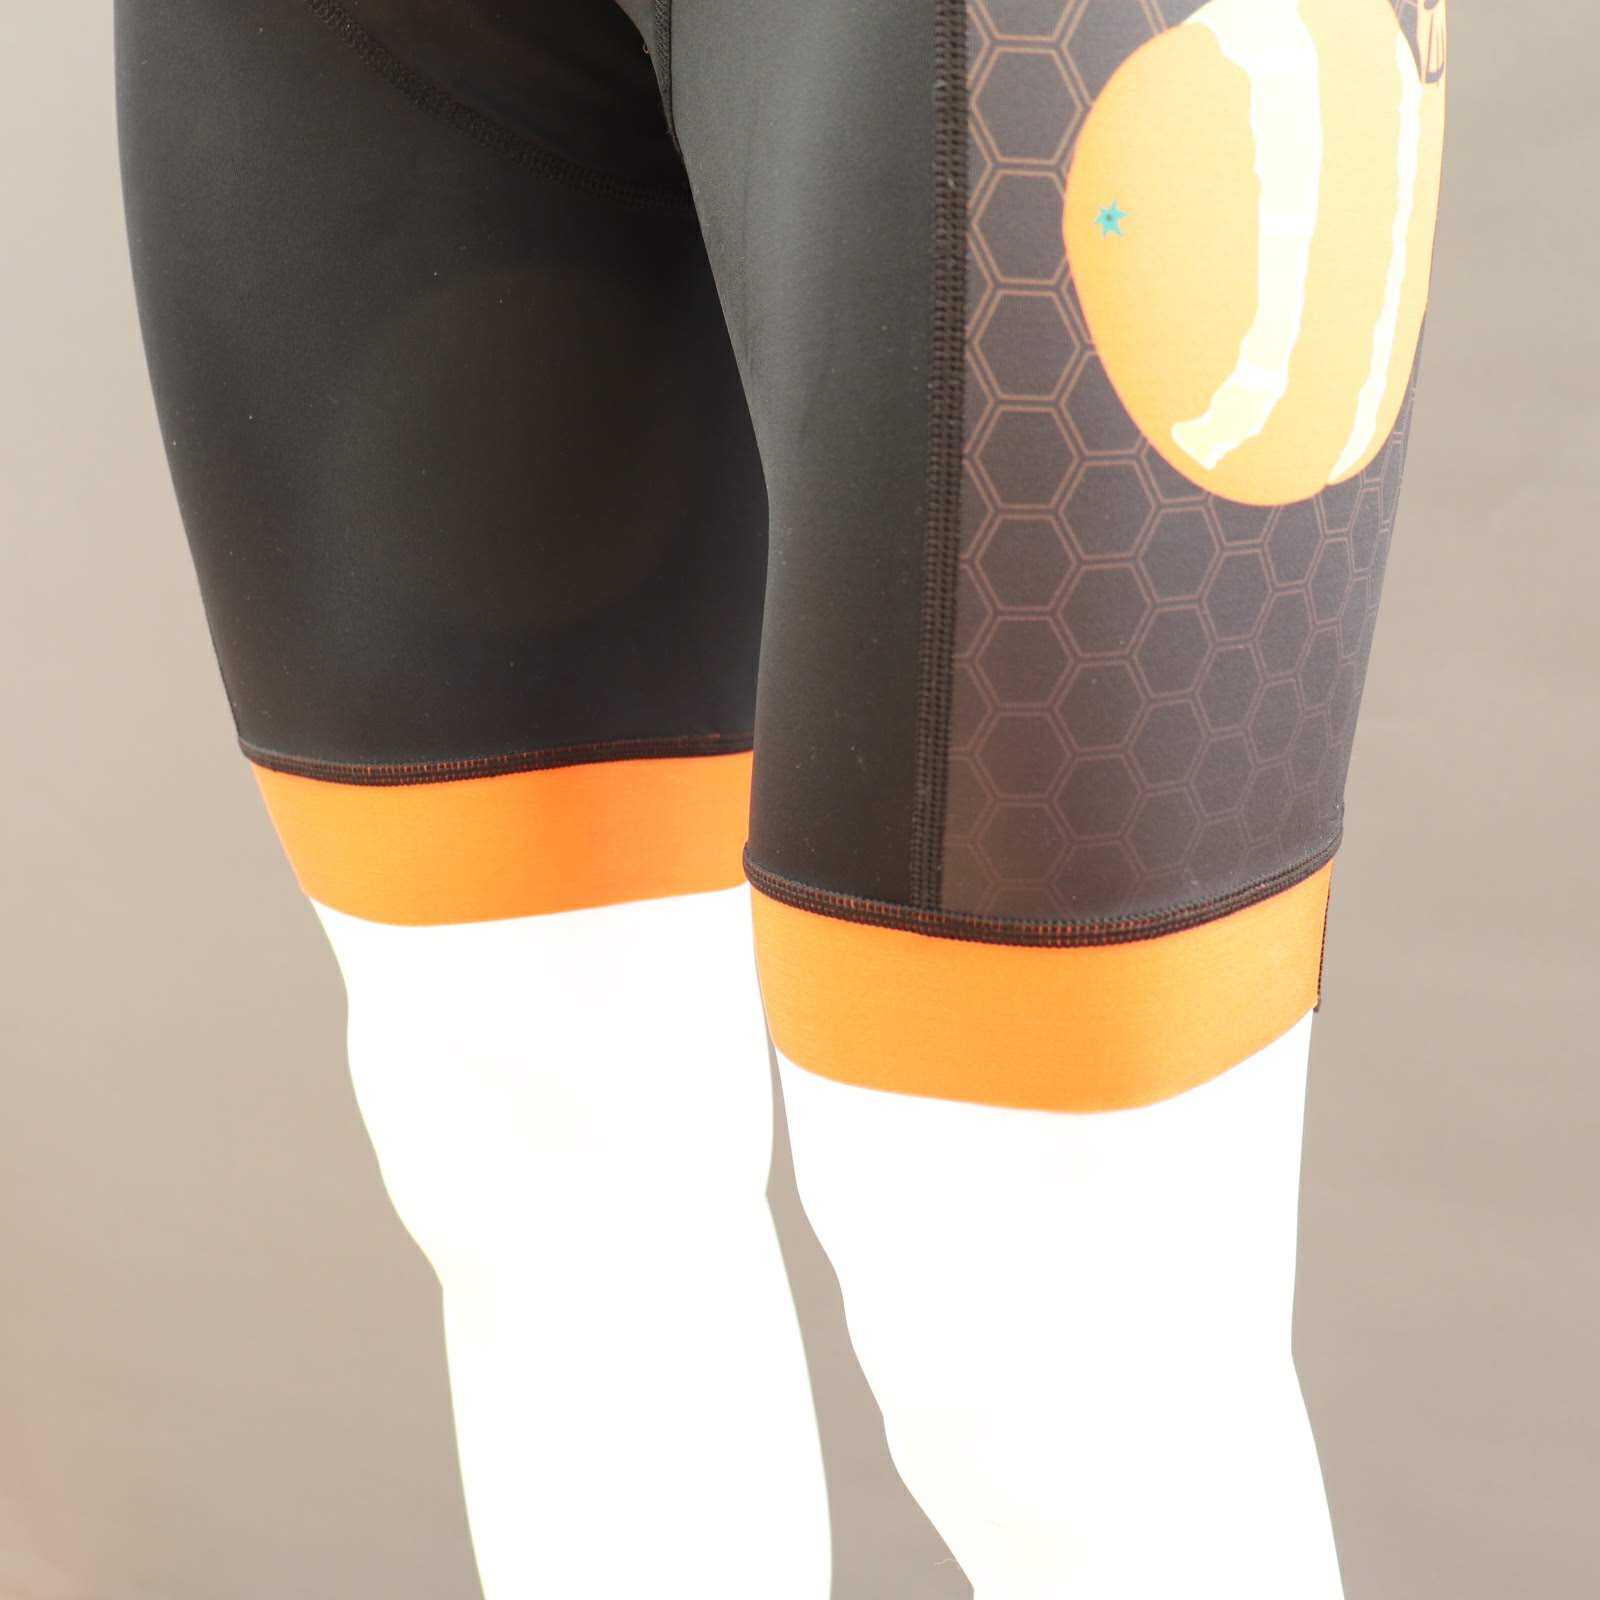 Pro Cycle Bib Shorts - Thin Comfort Gripper